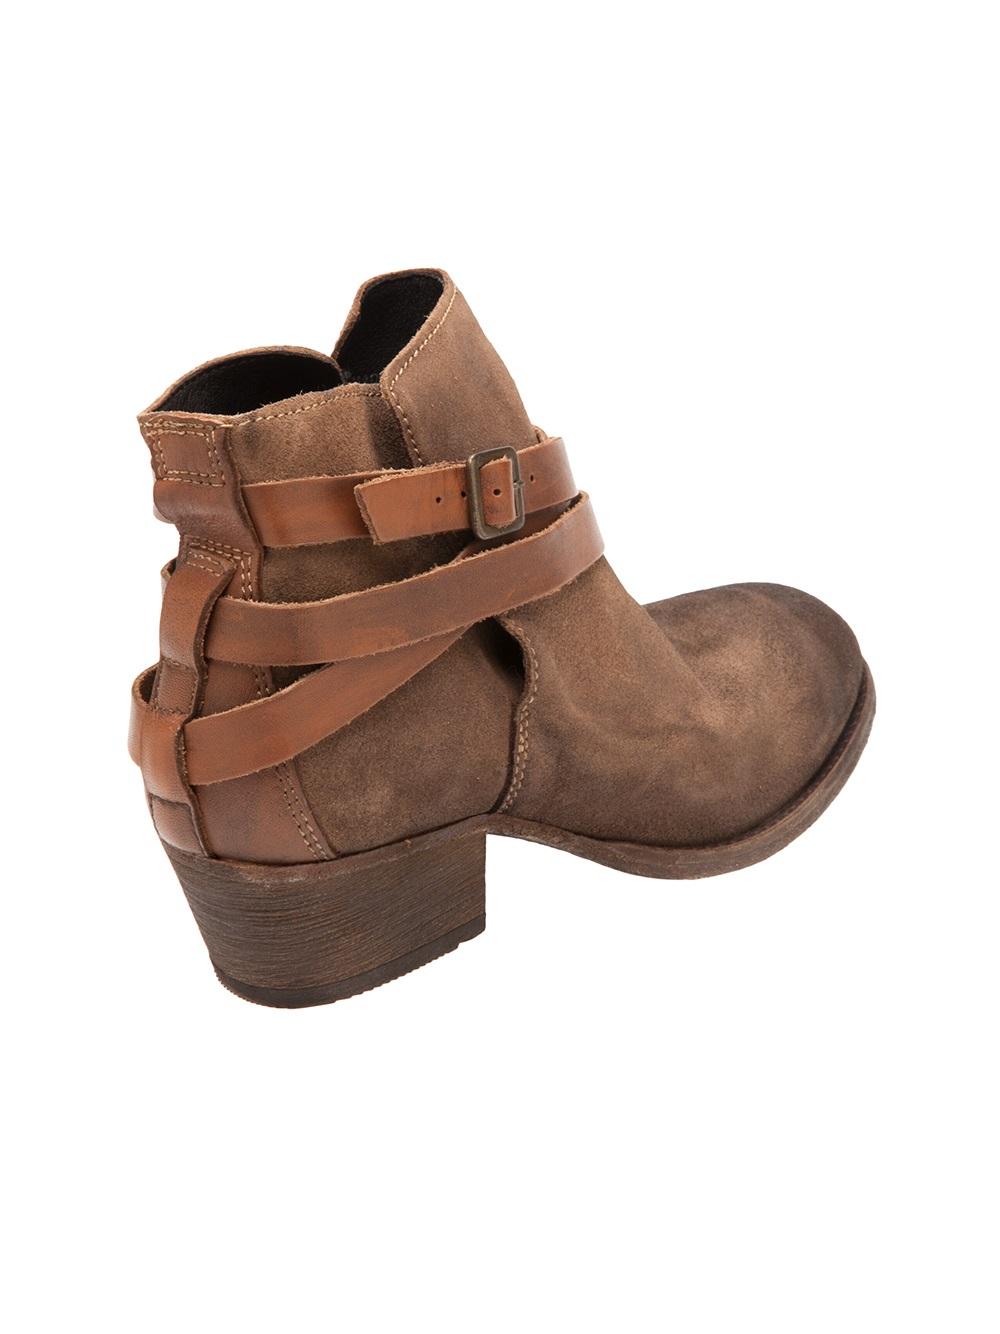 Reiss Brown Chunky Heel Shoes